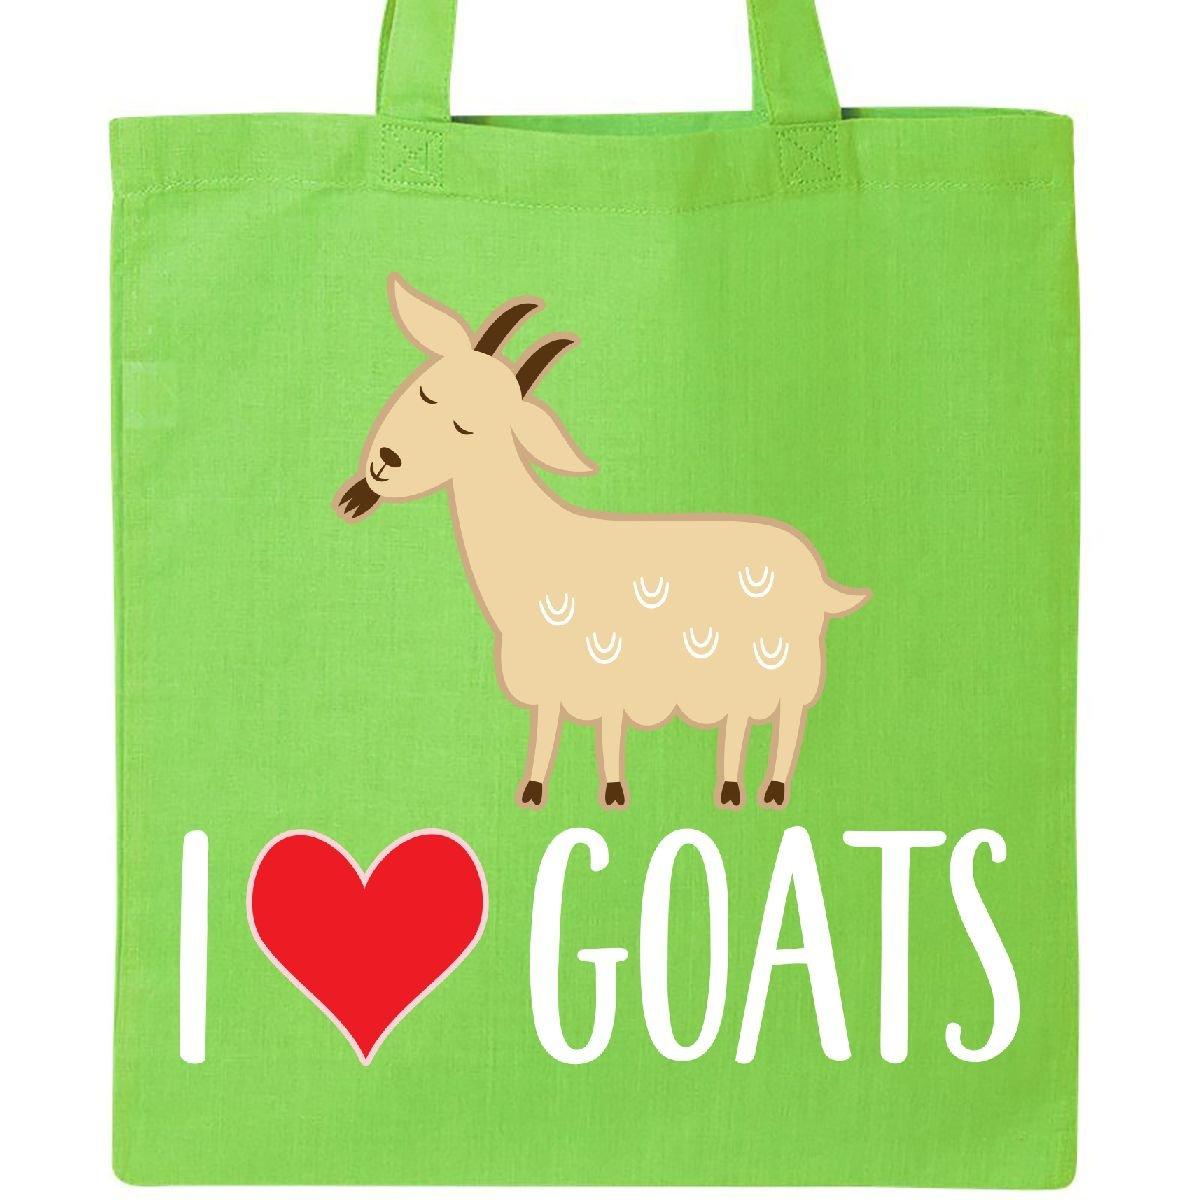 Inktastic Goat Cute I Love Goats Farm Animal Tote Bag Lime Green